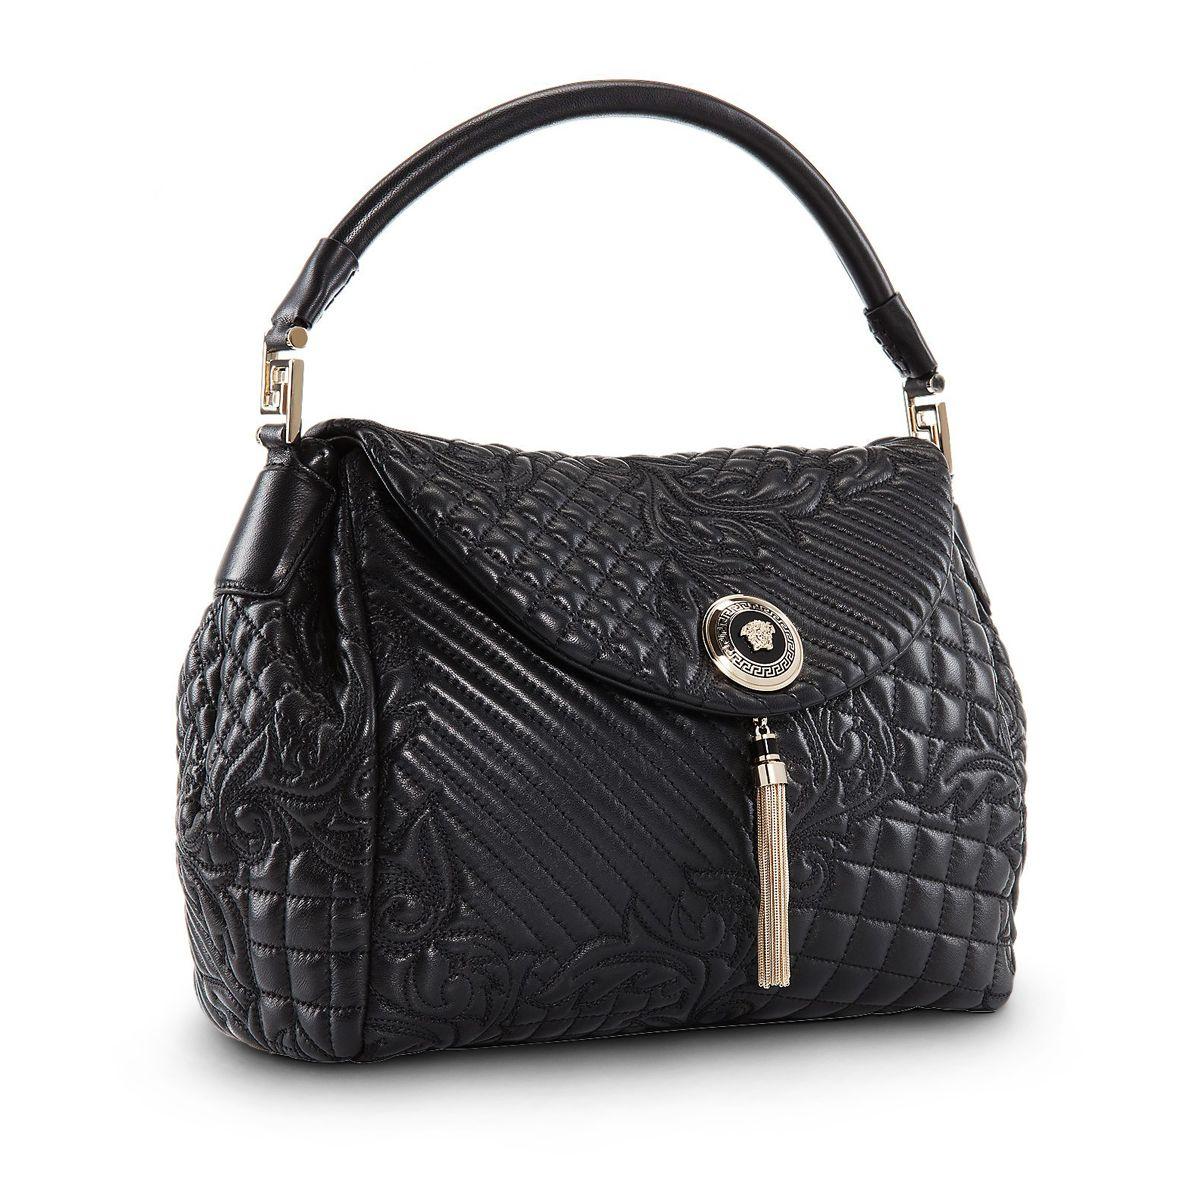 710be1d76c7a Tactile beauty -  Versace Vanitas Talia quilted nappa handbag. Find more  here  versace.com  VersaceVanitasBag